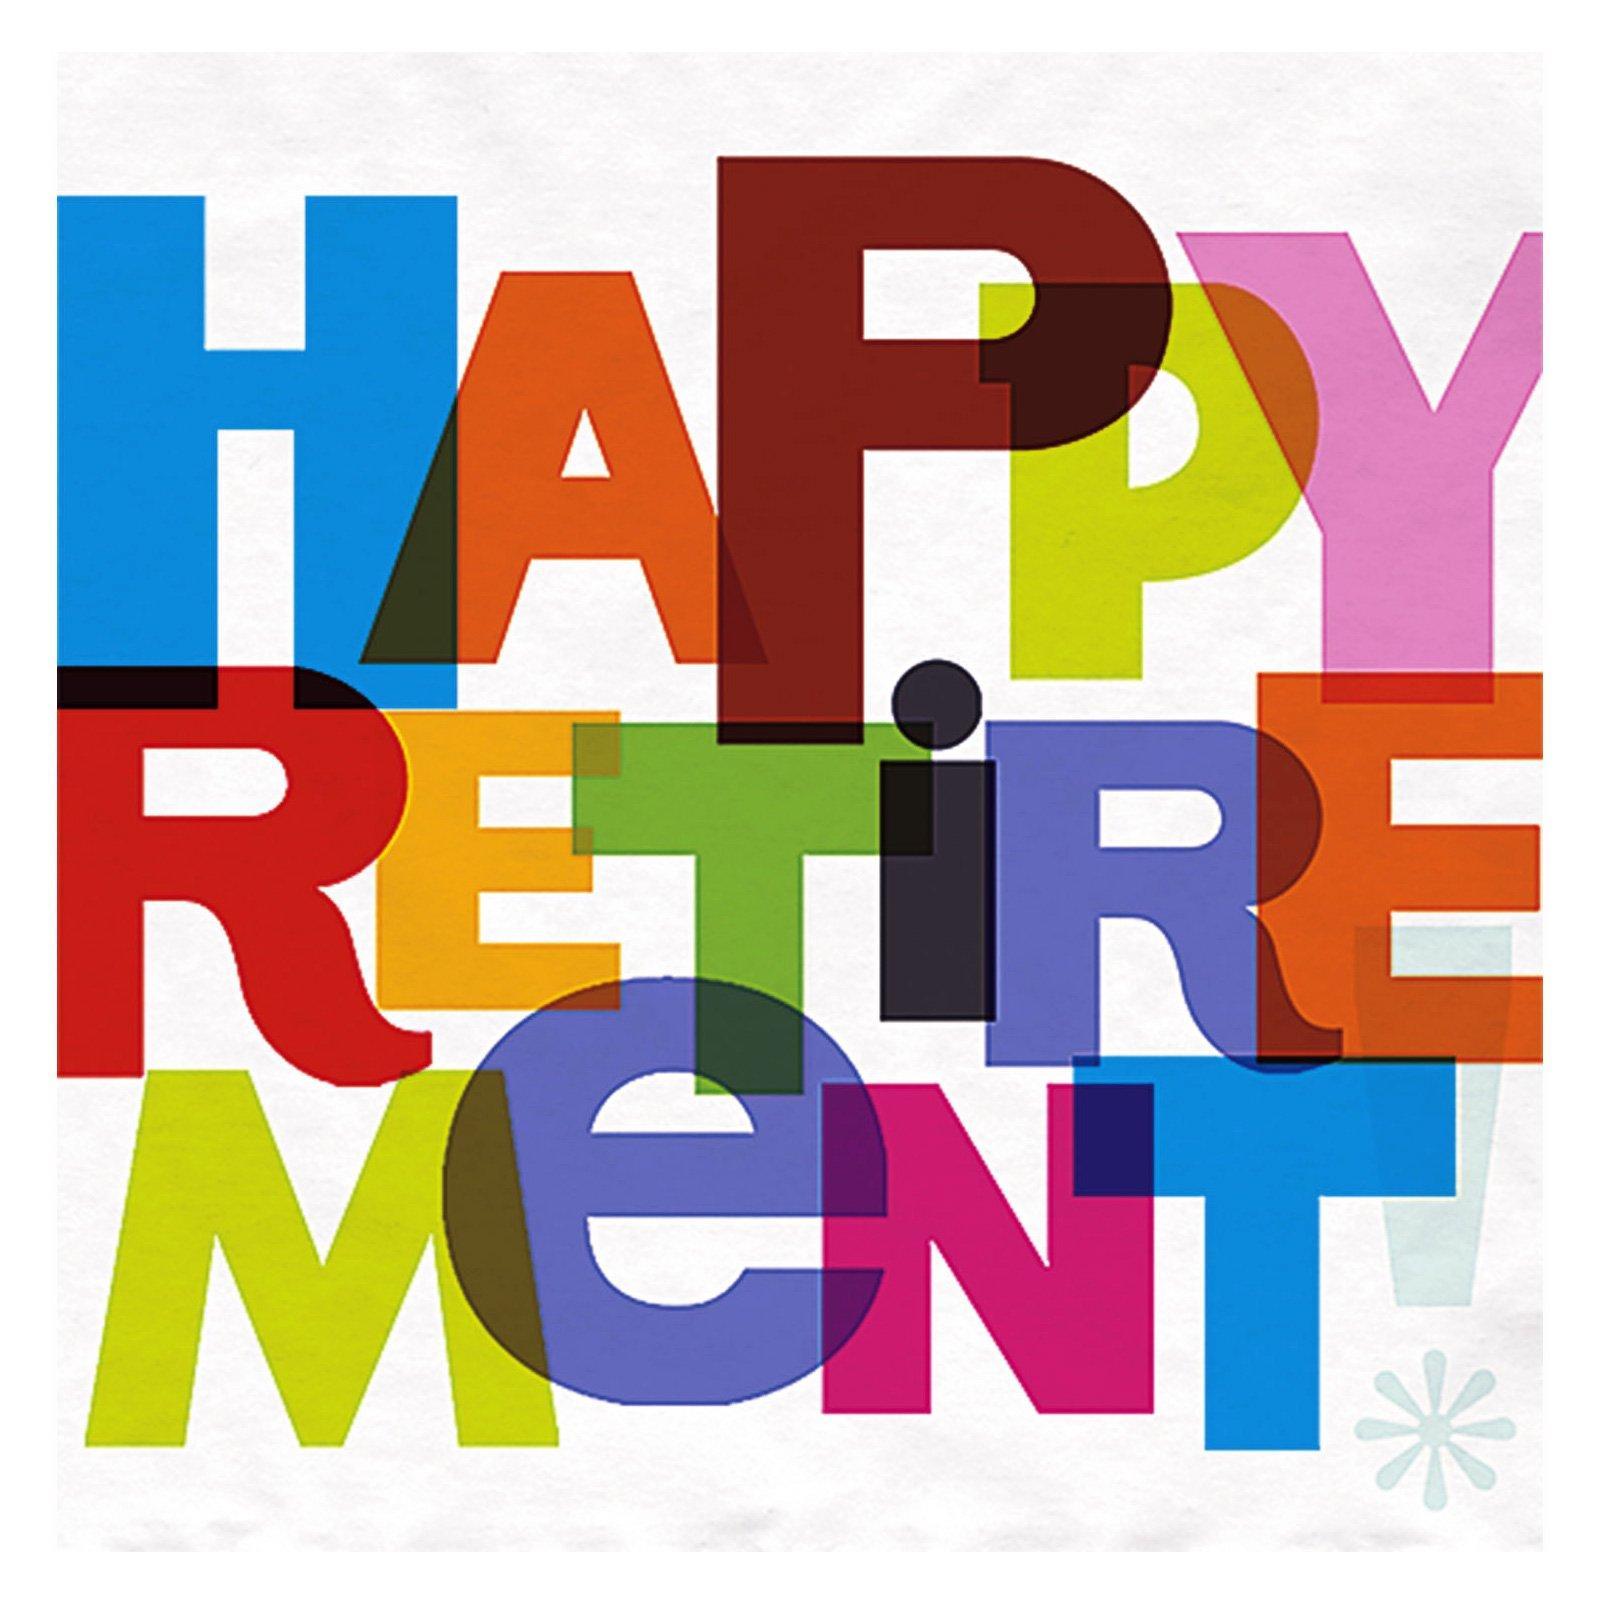 retirement clip art 12367 clipart panda free clipart images rh clipartpanda com retirement clipart funny retirement clipart funny